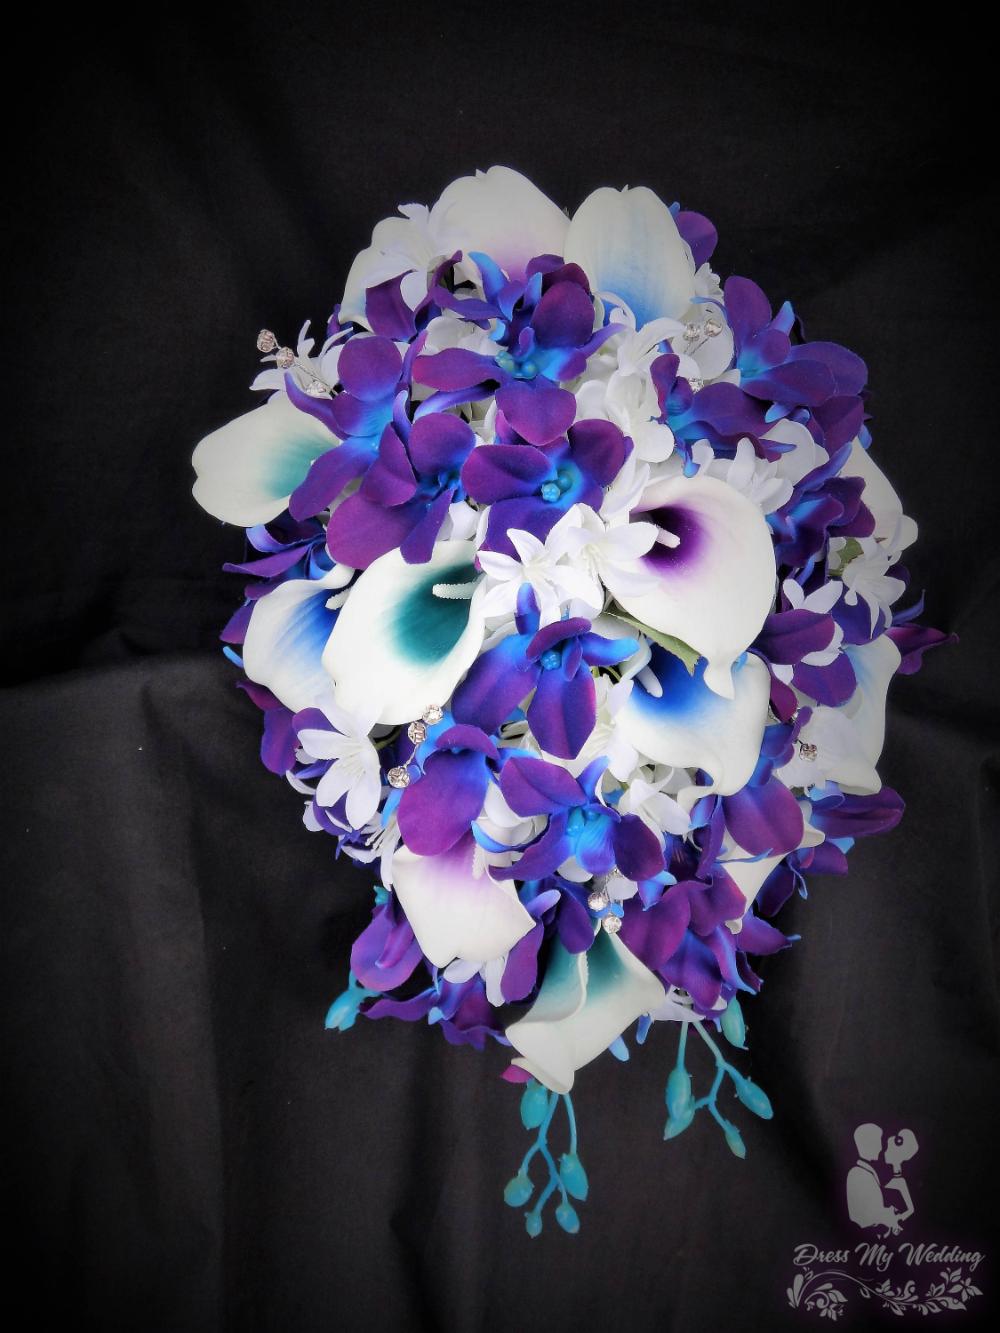 Galaxy orchid bridal bouquet #bridalbouquetpurple Dress My Wedding – Galaxy orchid bridal bouquet #whitebridalbouquets